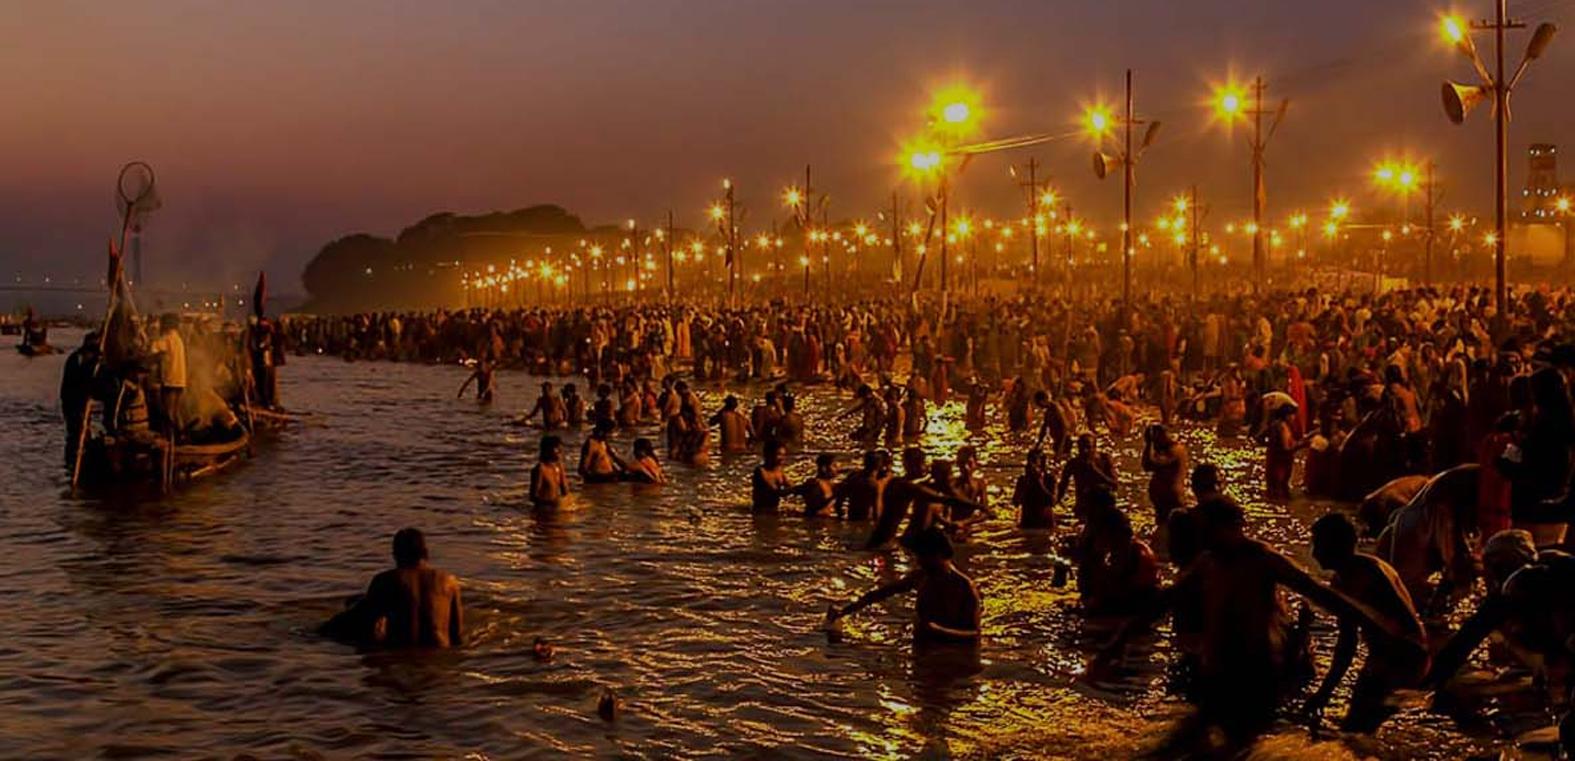 Amazing night experience during Allahabad Kumbh Mela